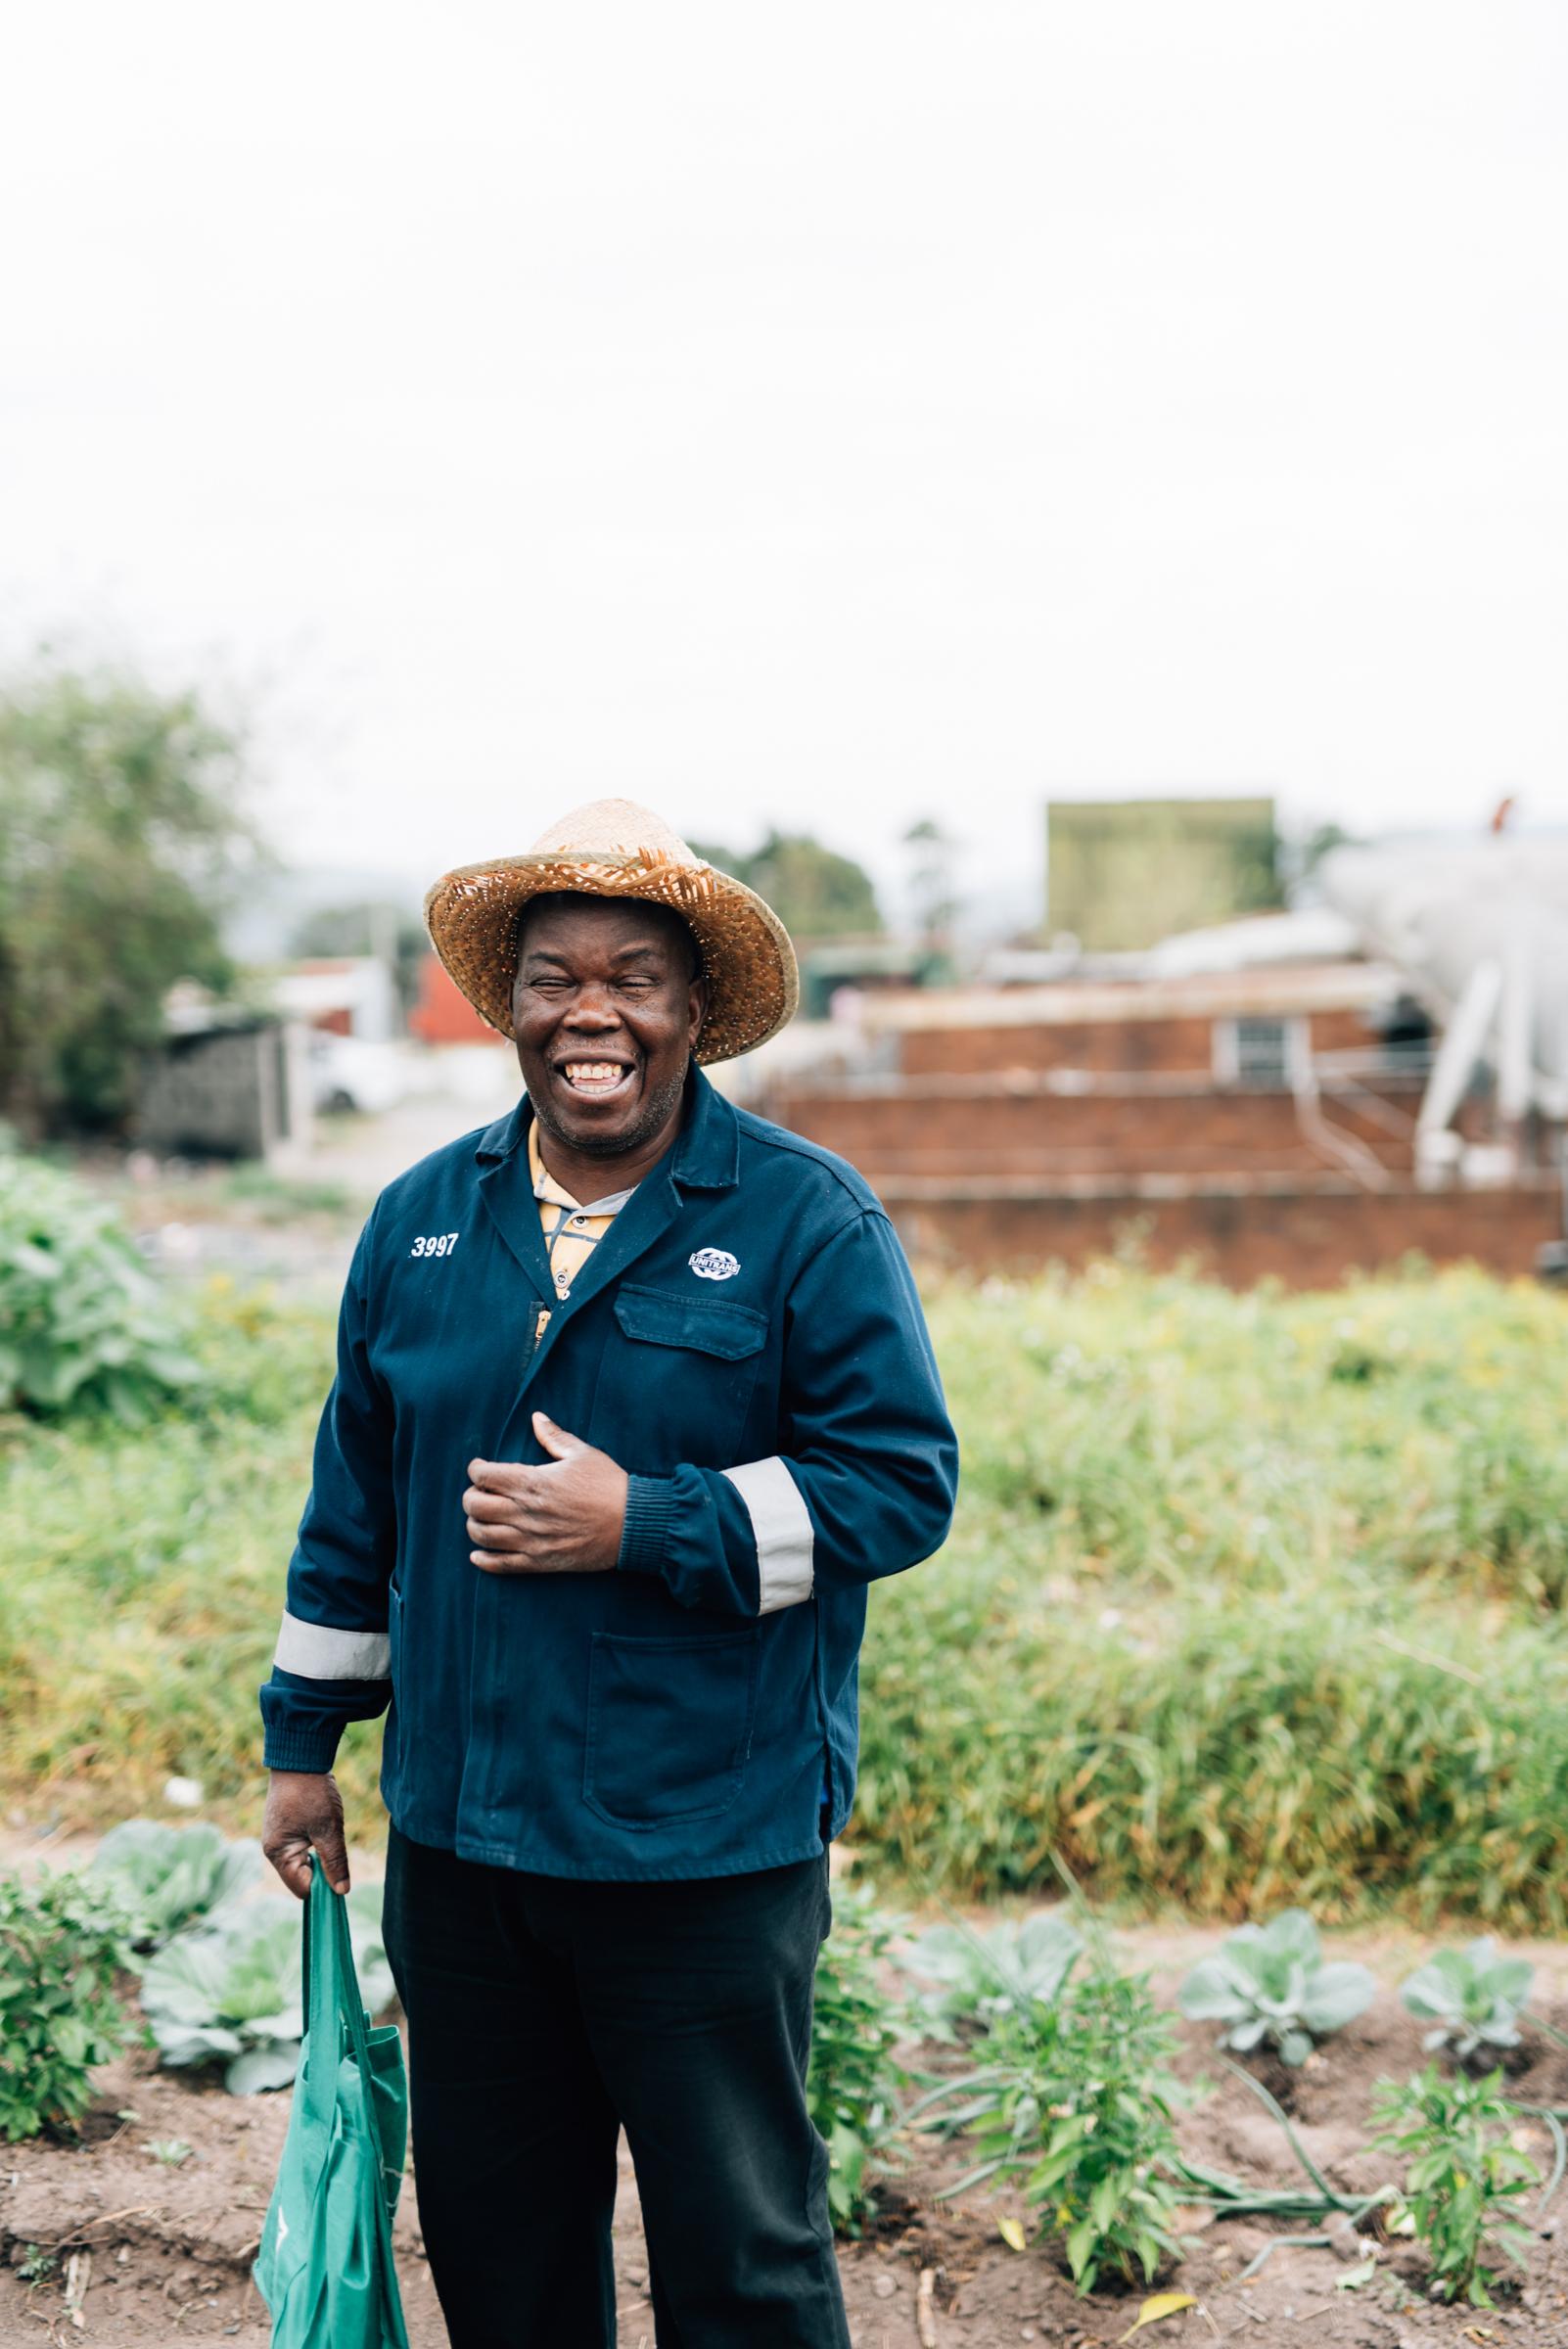 Amos Shabalala